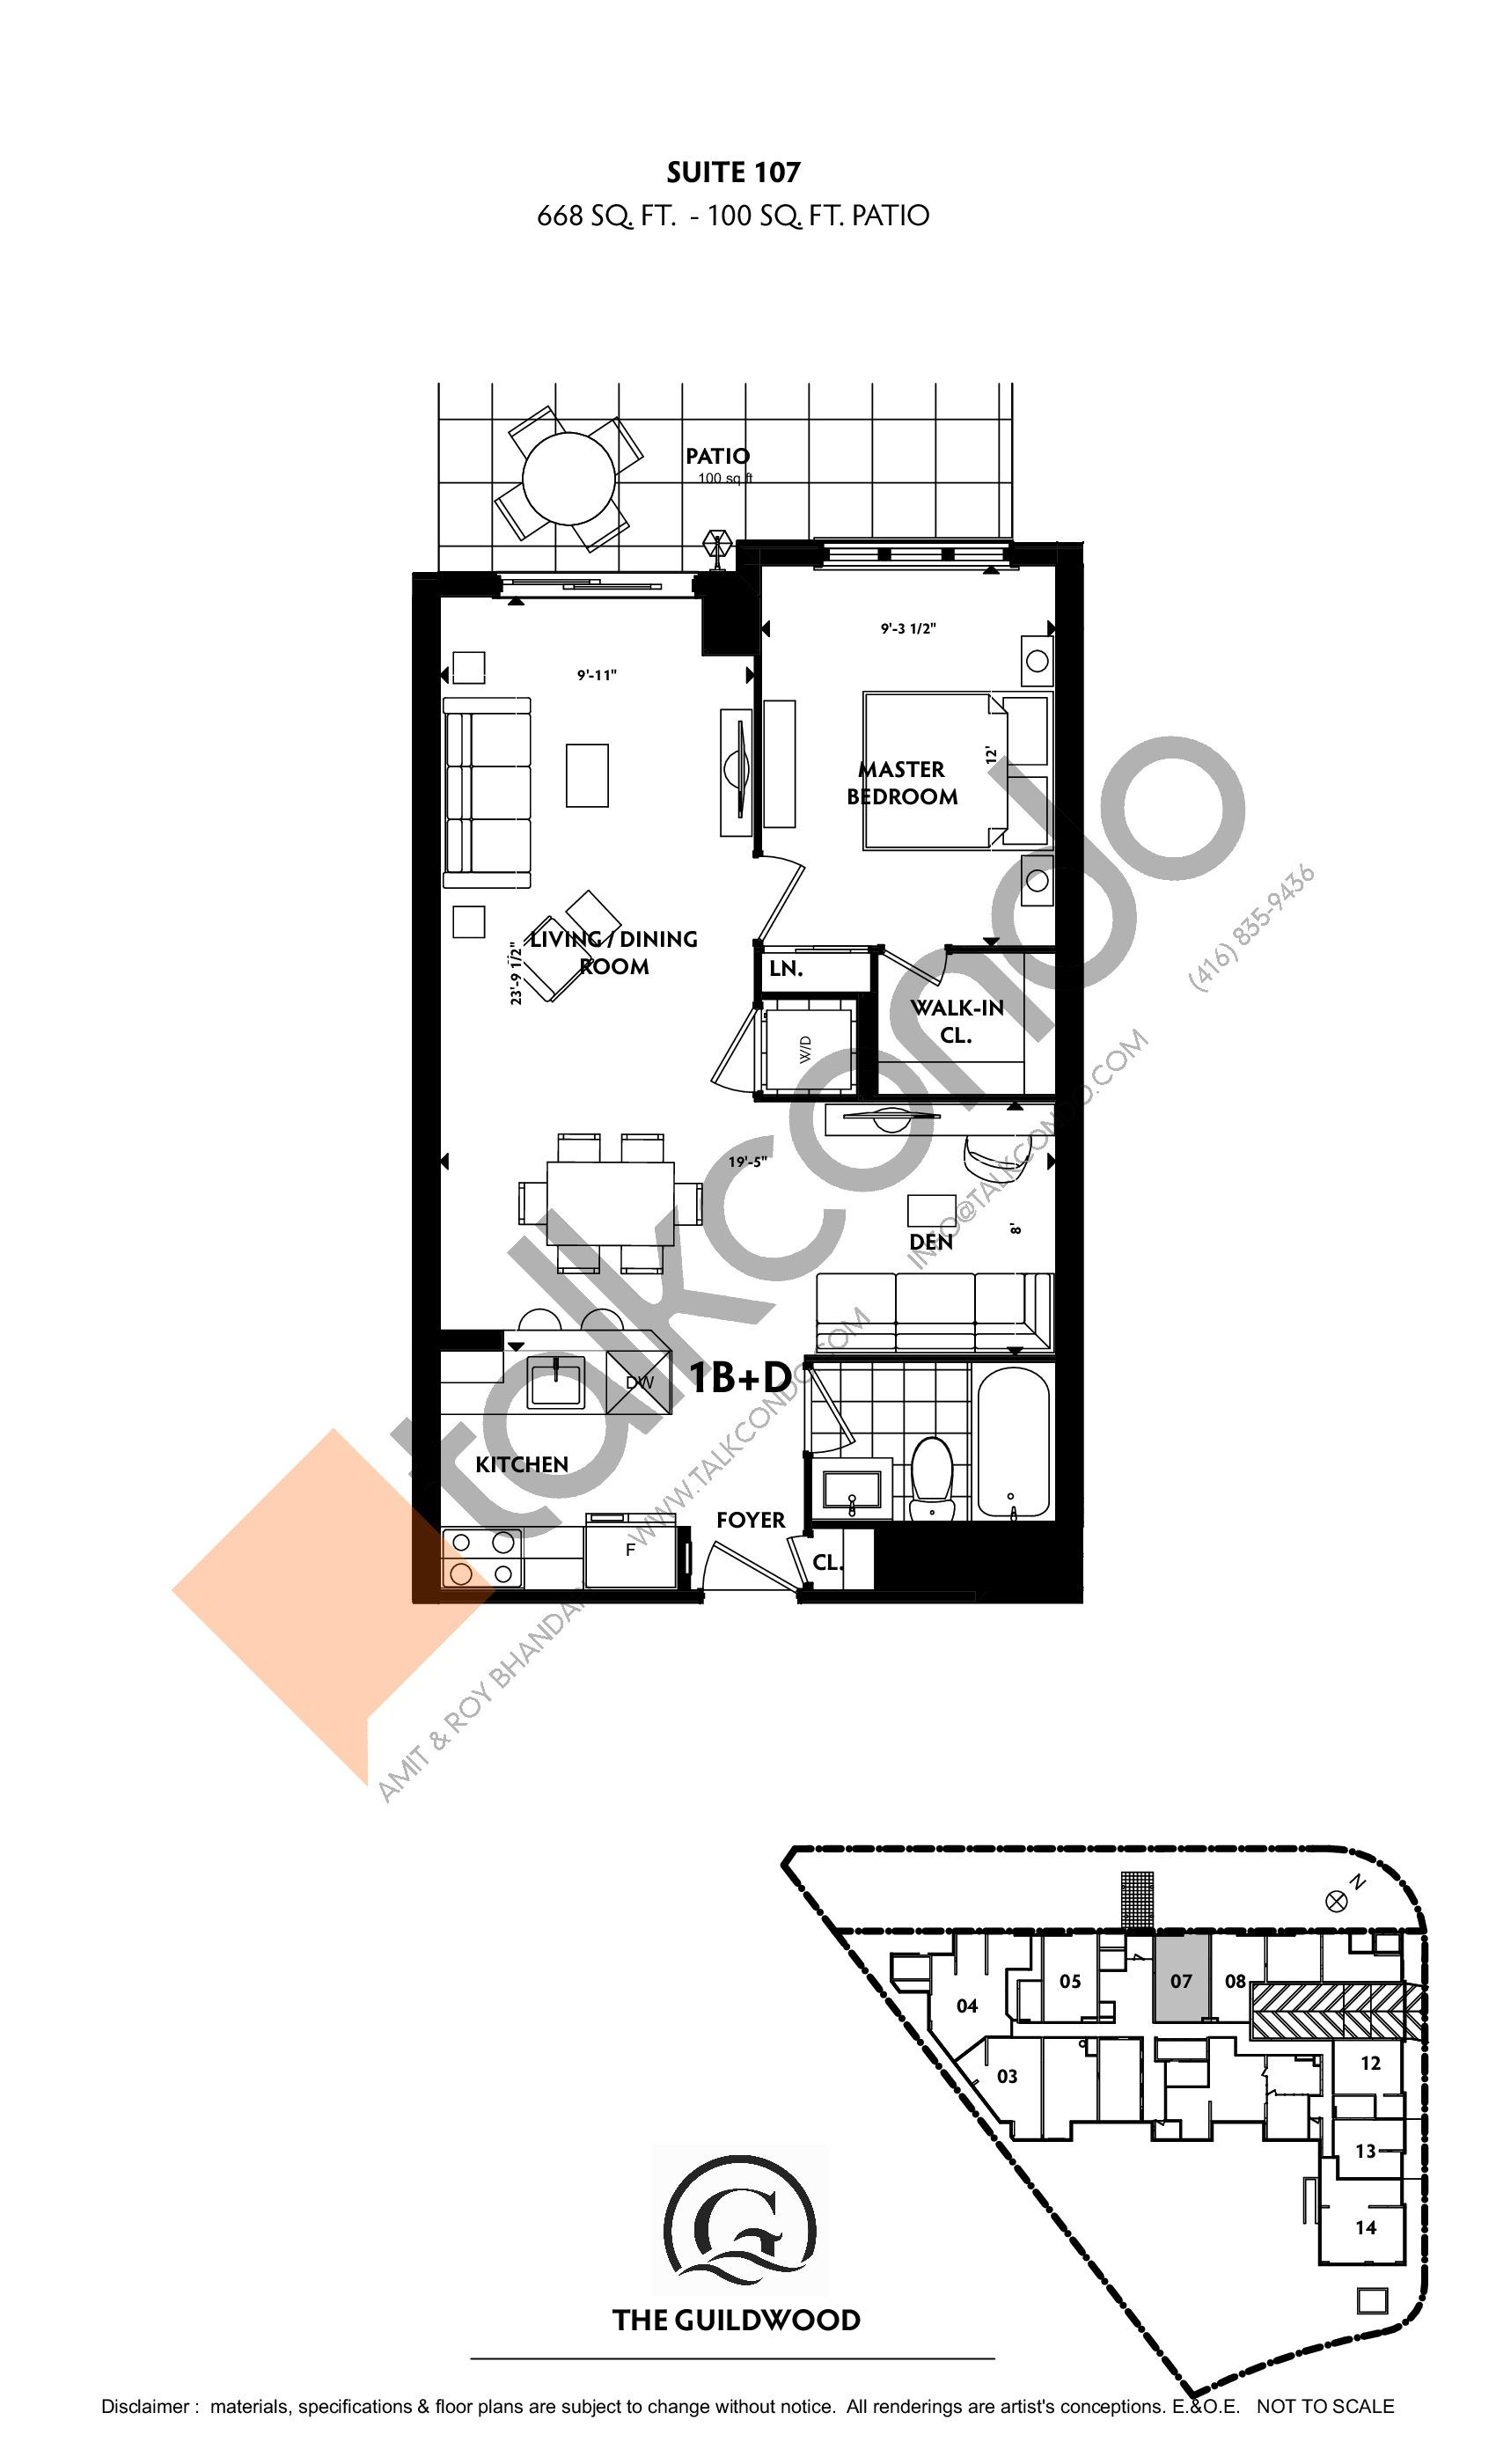 Suite 107 Floor Plan at Guildwood Condos - 668 sq.ft